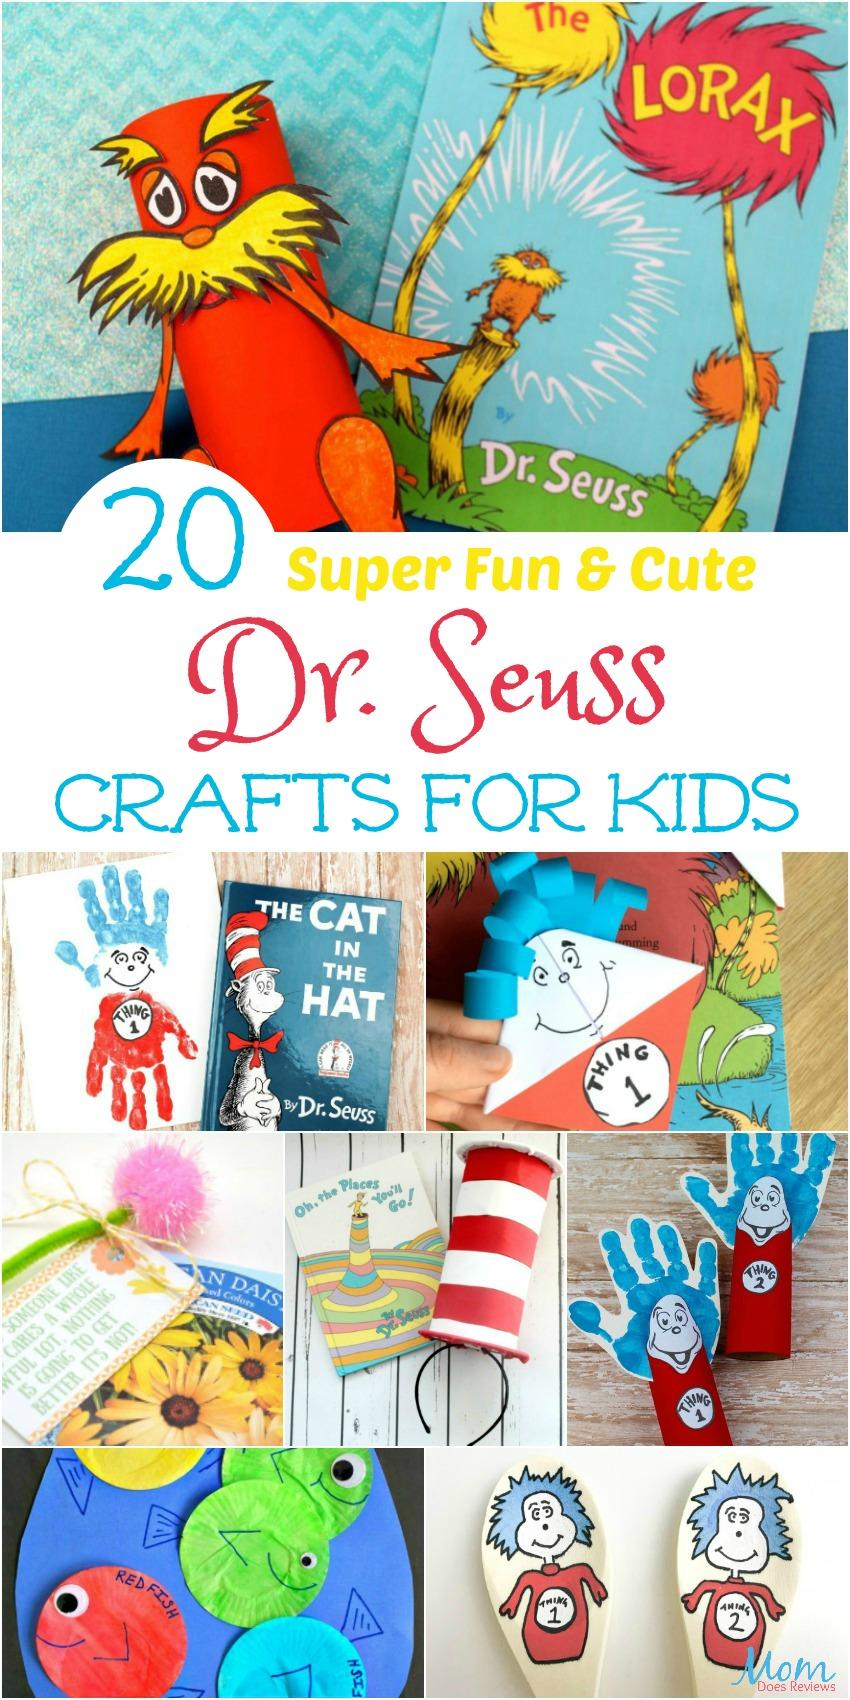 20 Super Fun & Cute Dr. Seuss Crafts for Kids  #crafts #funstuff #drseuss #fun #momapproved